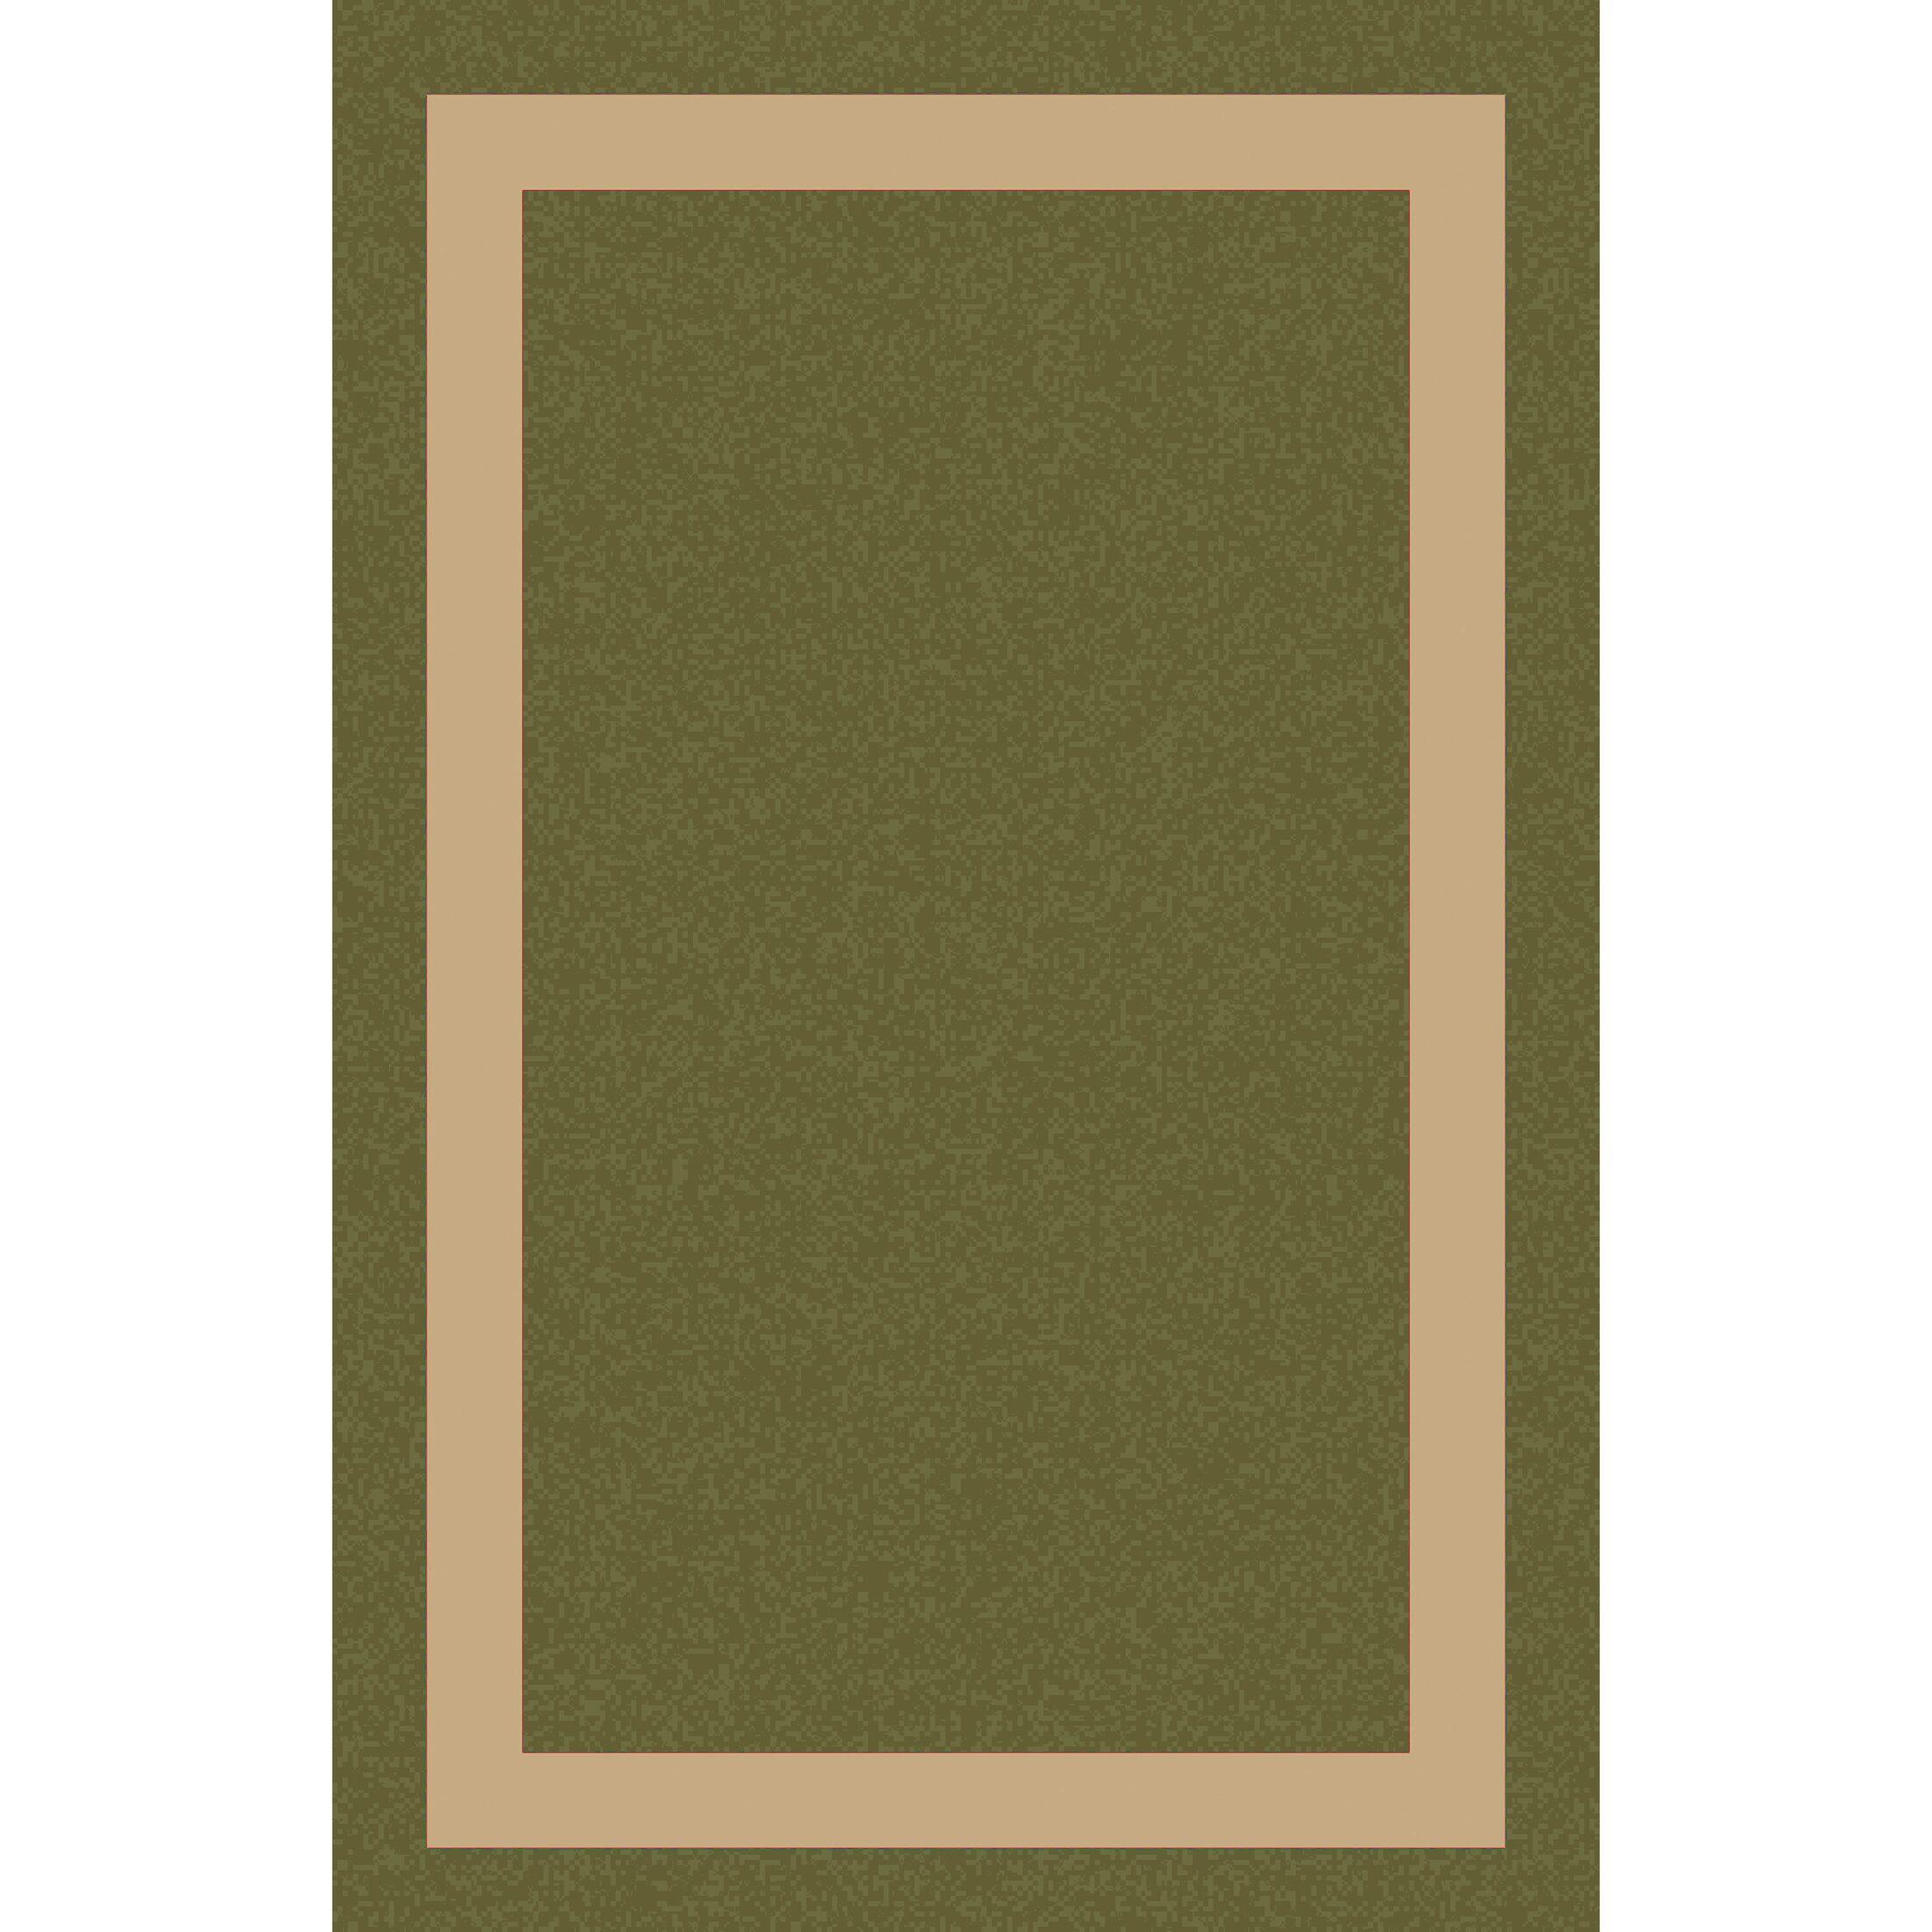 Koppel Hand-Woven Grass Green/Khaki Area Rug Rug Size: Round 8'